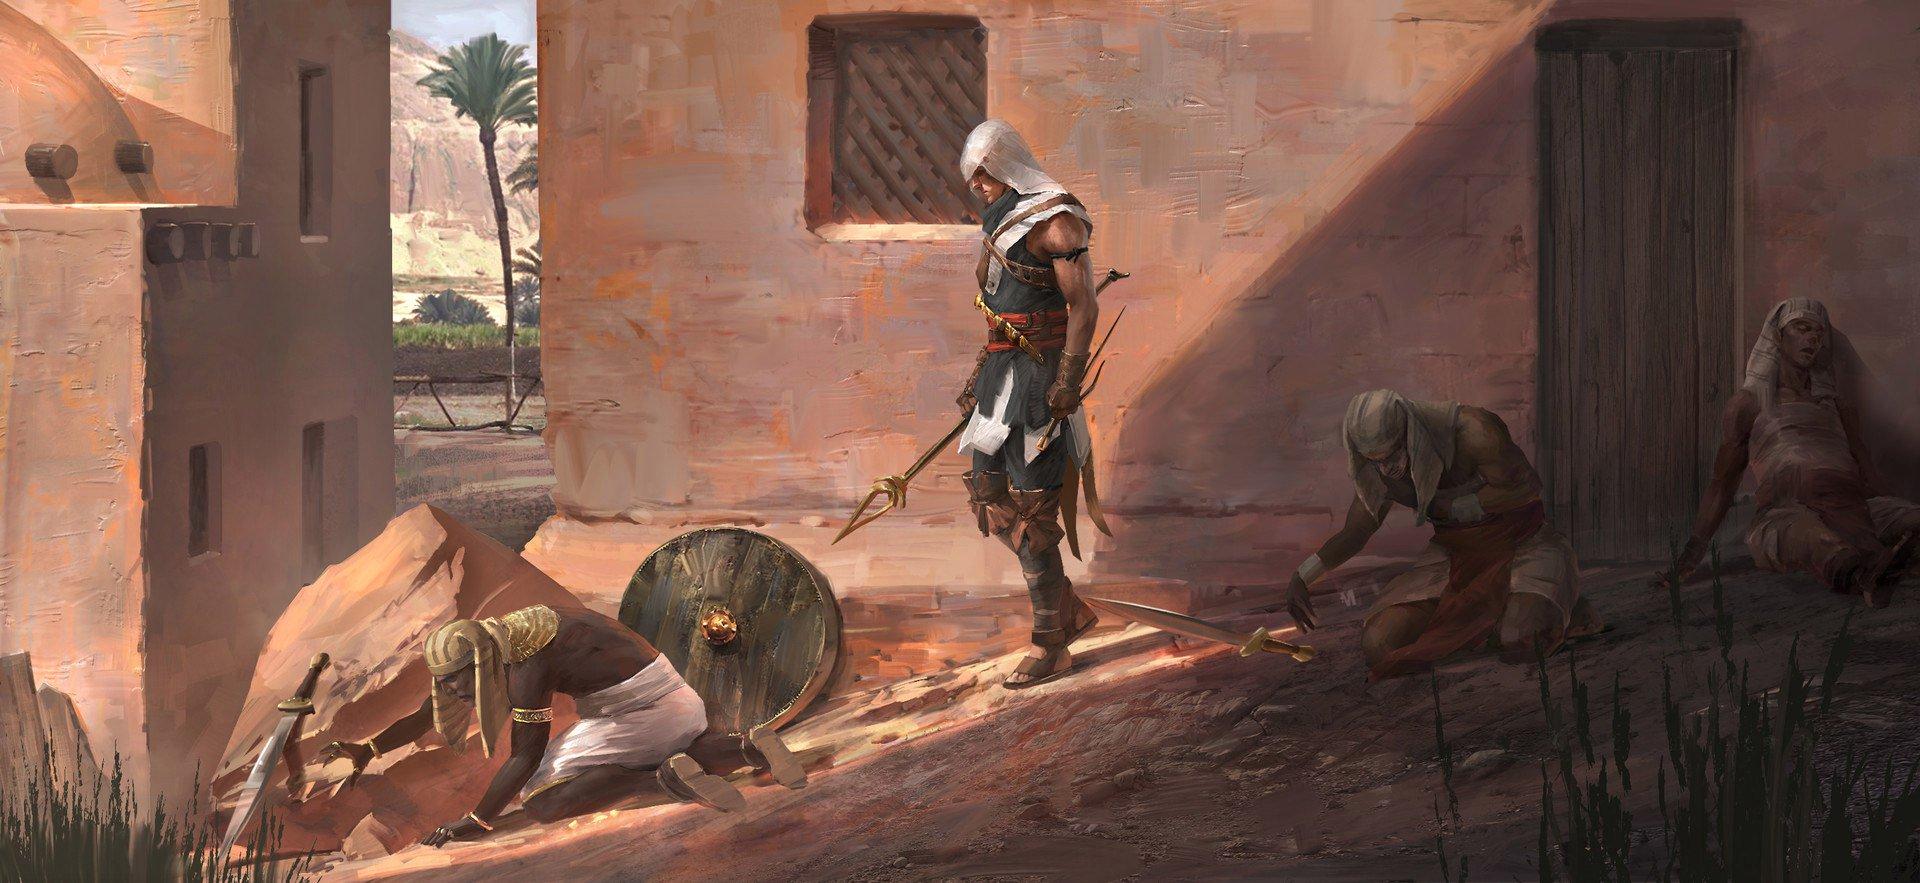 hard back assassins creed orig - HD1920×883